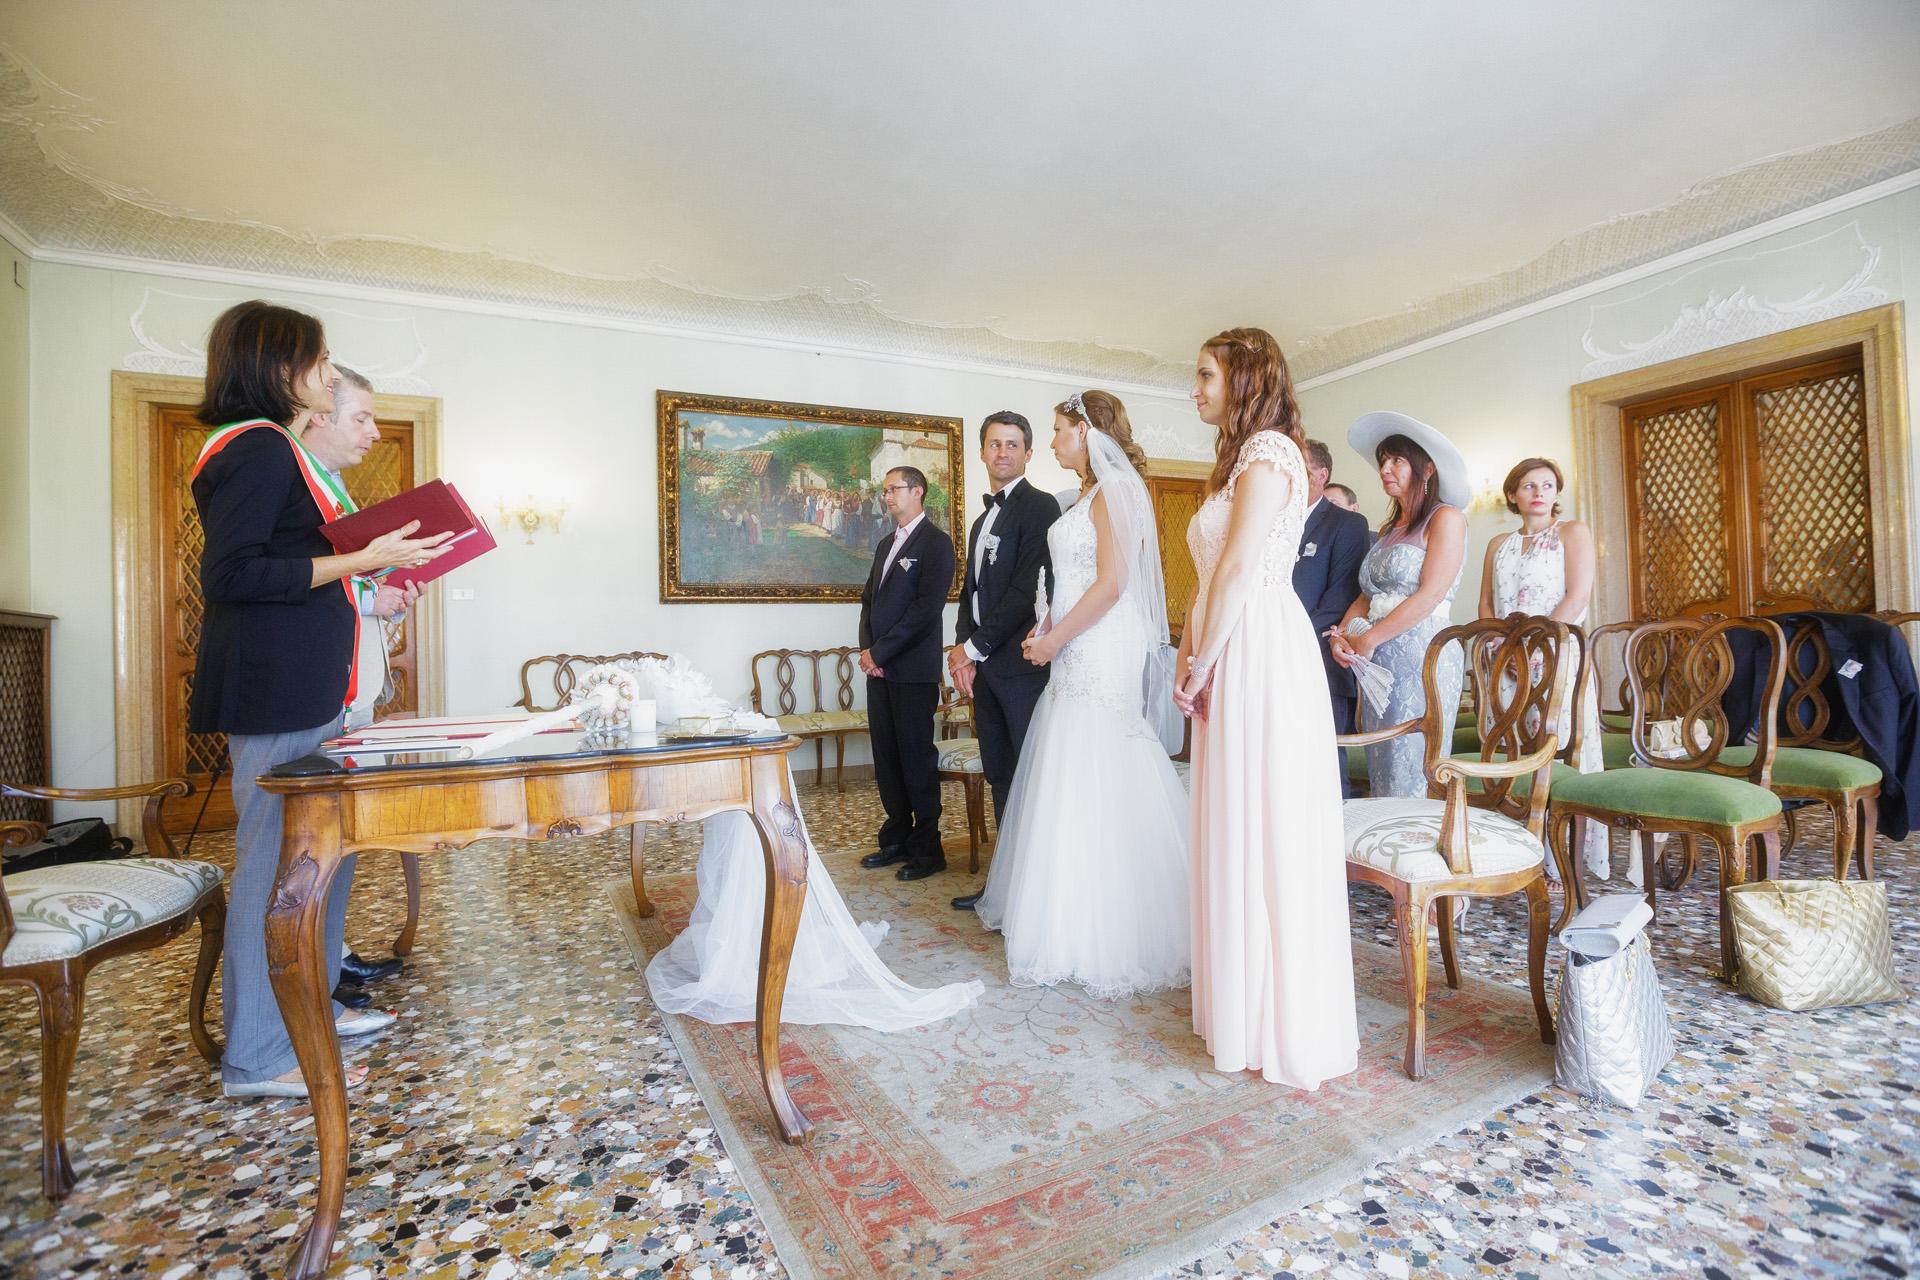 Foto de la ceremonia de Elopement - Venecia, Italia | La ceremonia oficial de boda al aire libre.